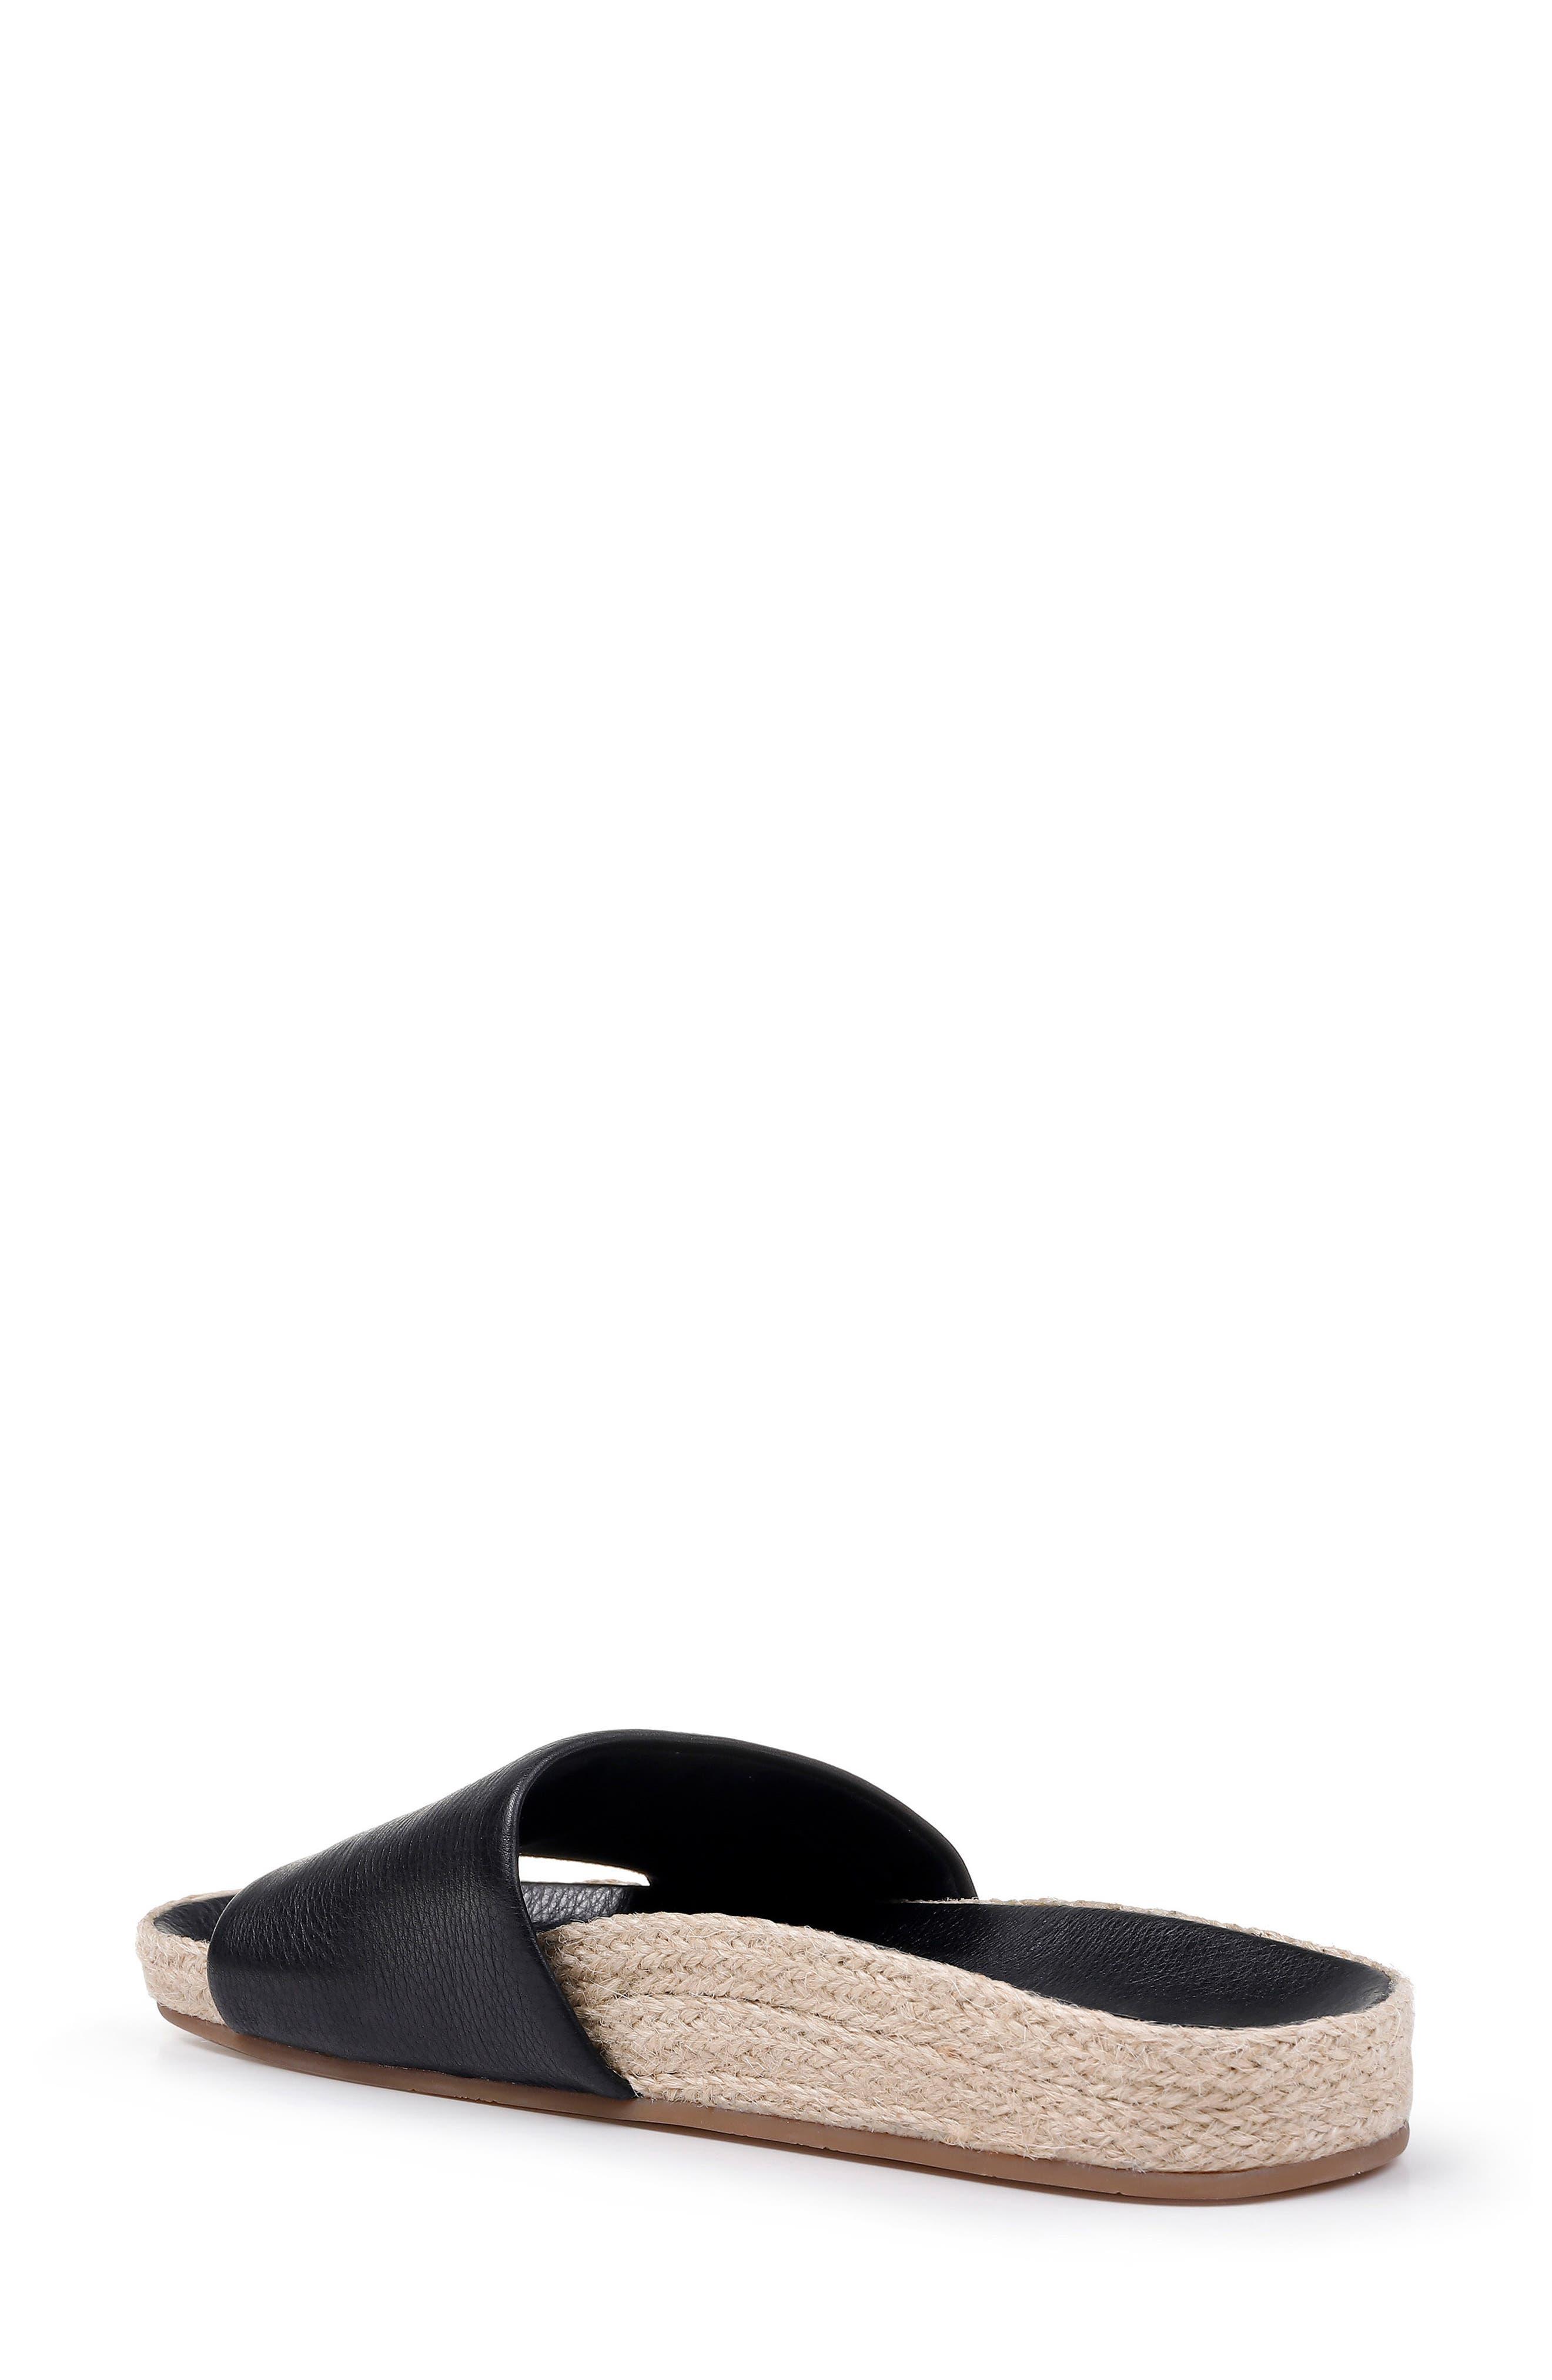 SPLENDID, Sandford Espadrille Slide Sandal, Alternate thumbnail 2, color, BLACK LEATHER